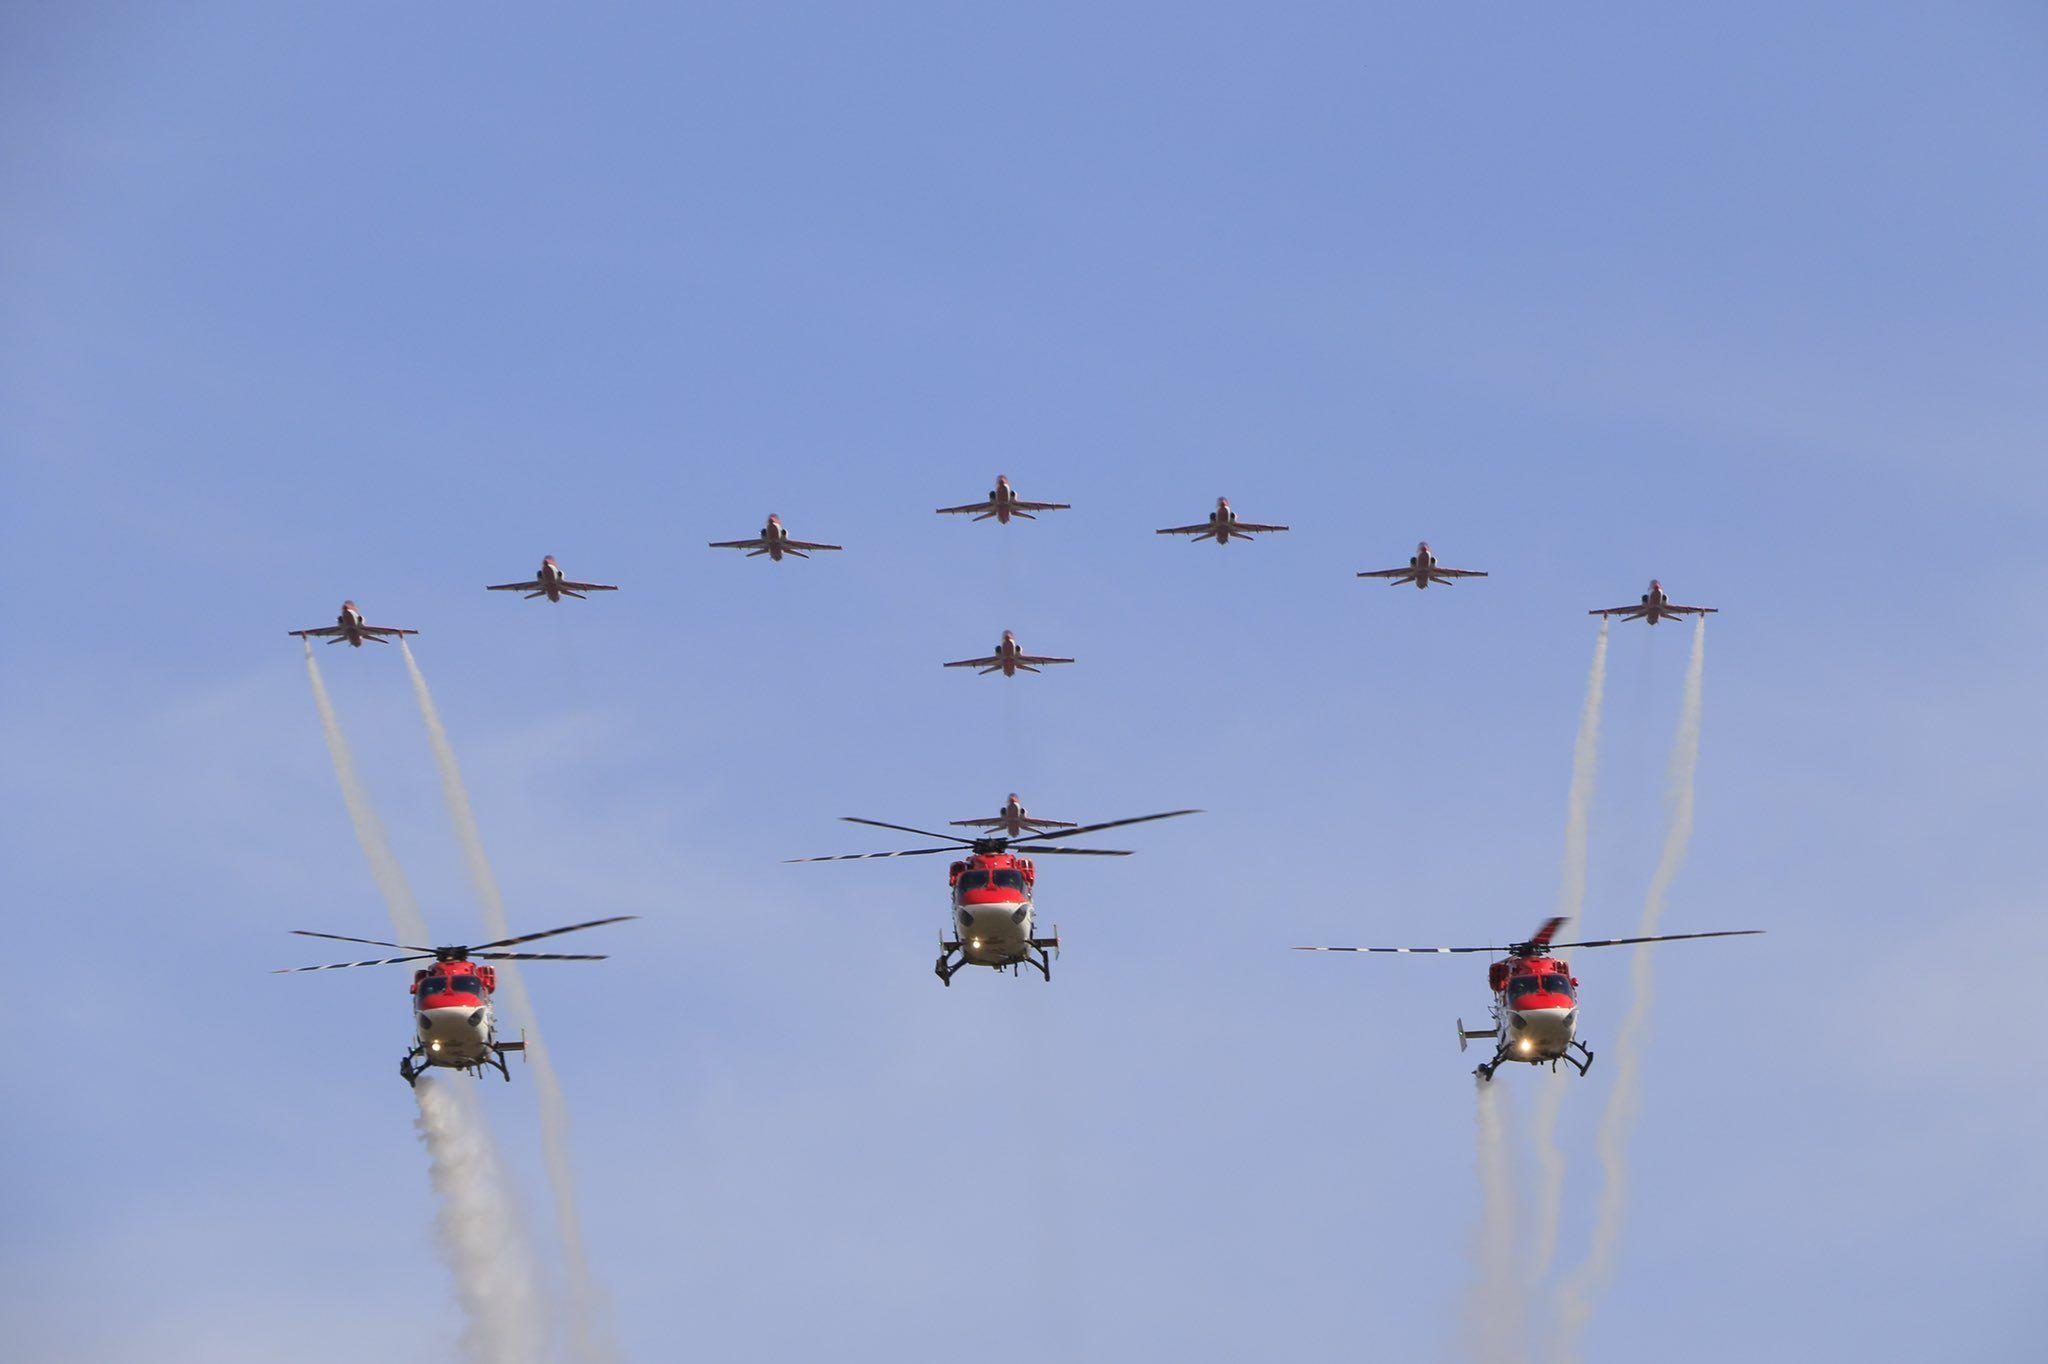 Aero India Show 2021: IAF's Surya Kiran & Sarang showcase breathtaking aerobatic display